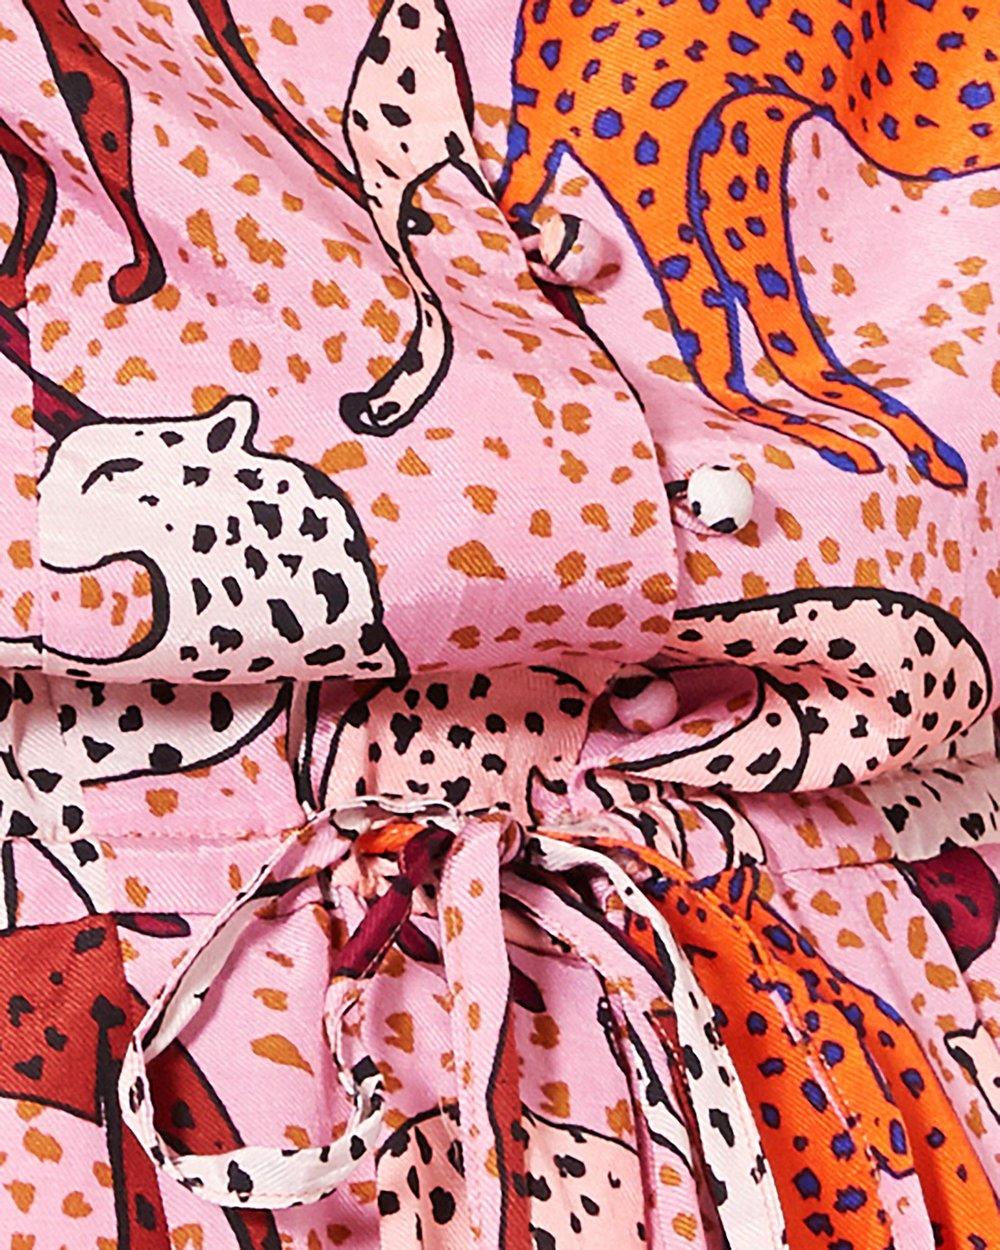 65bfe83a83 Feline Fine Playsuit by Gorman Online